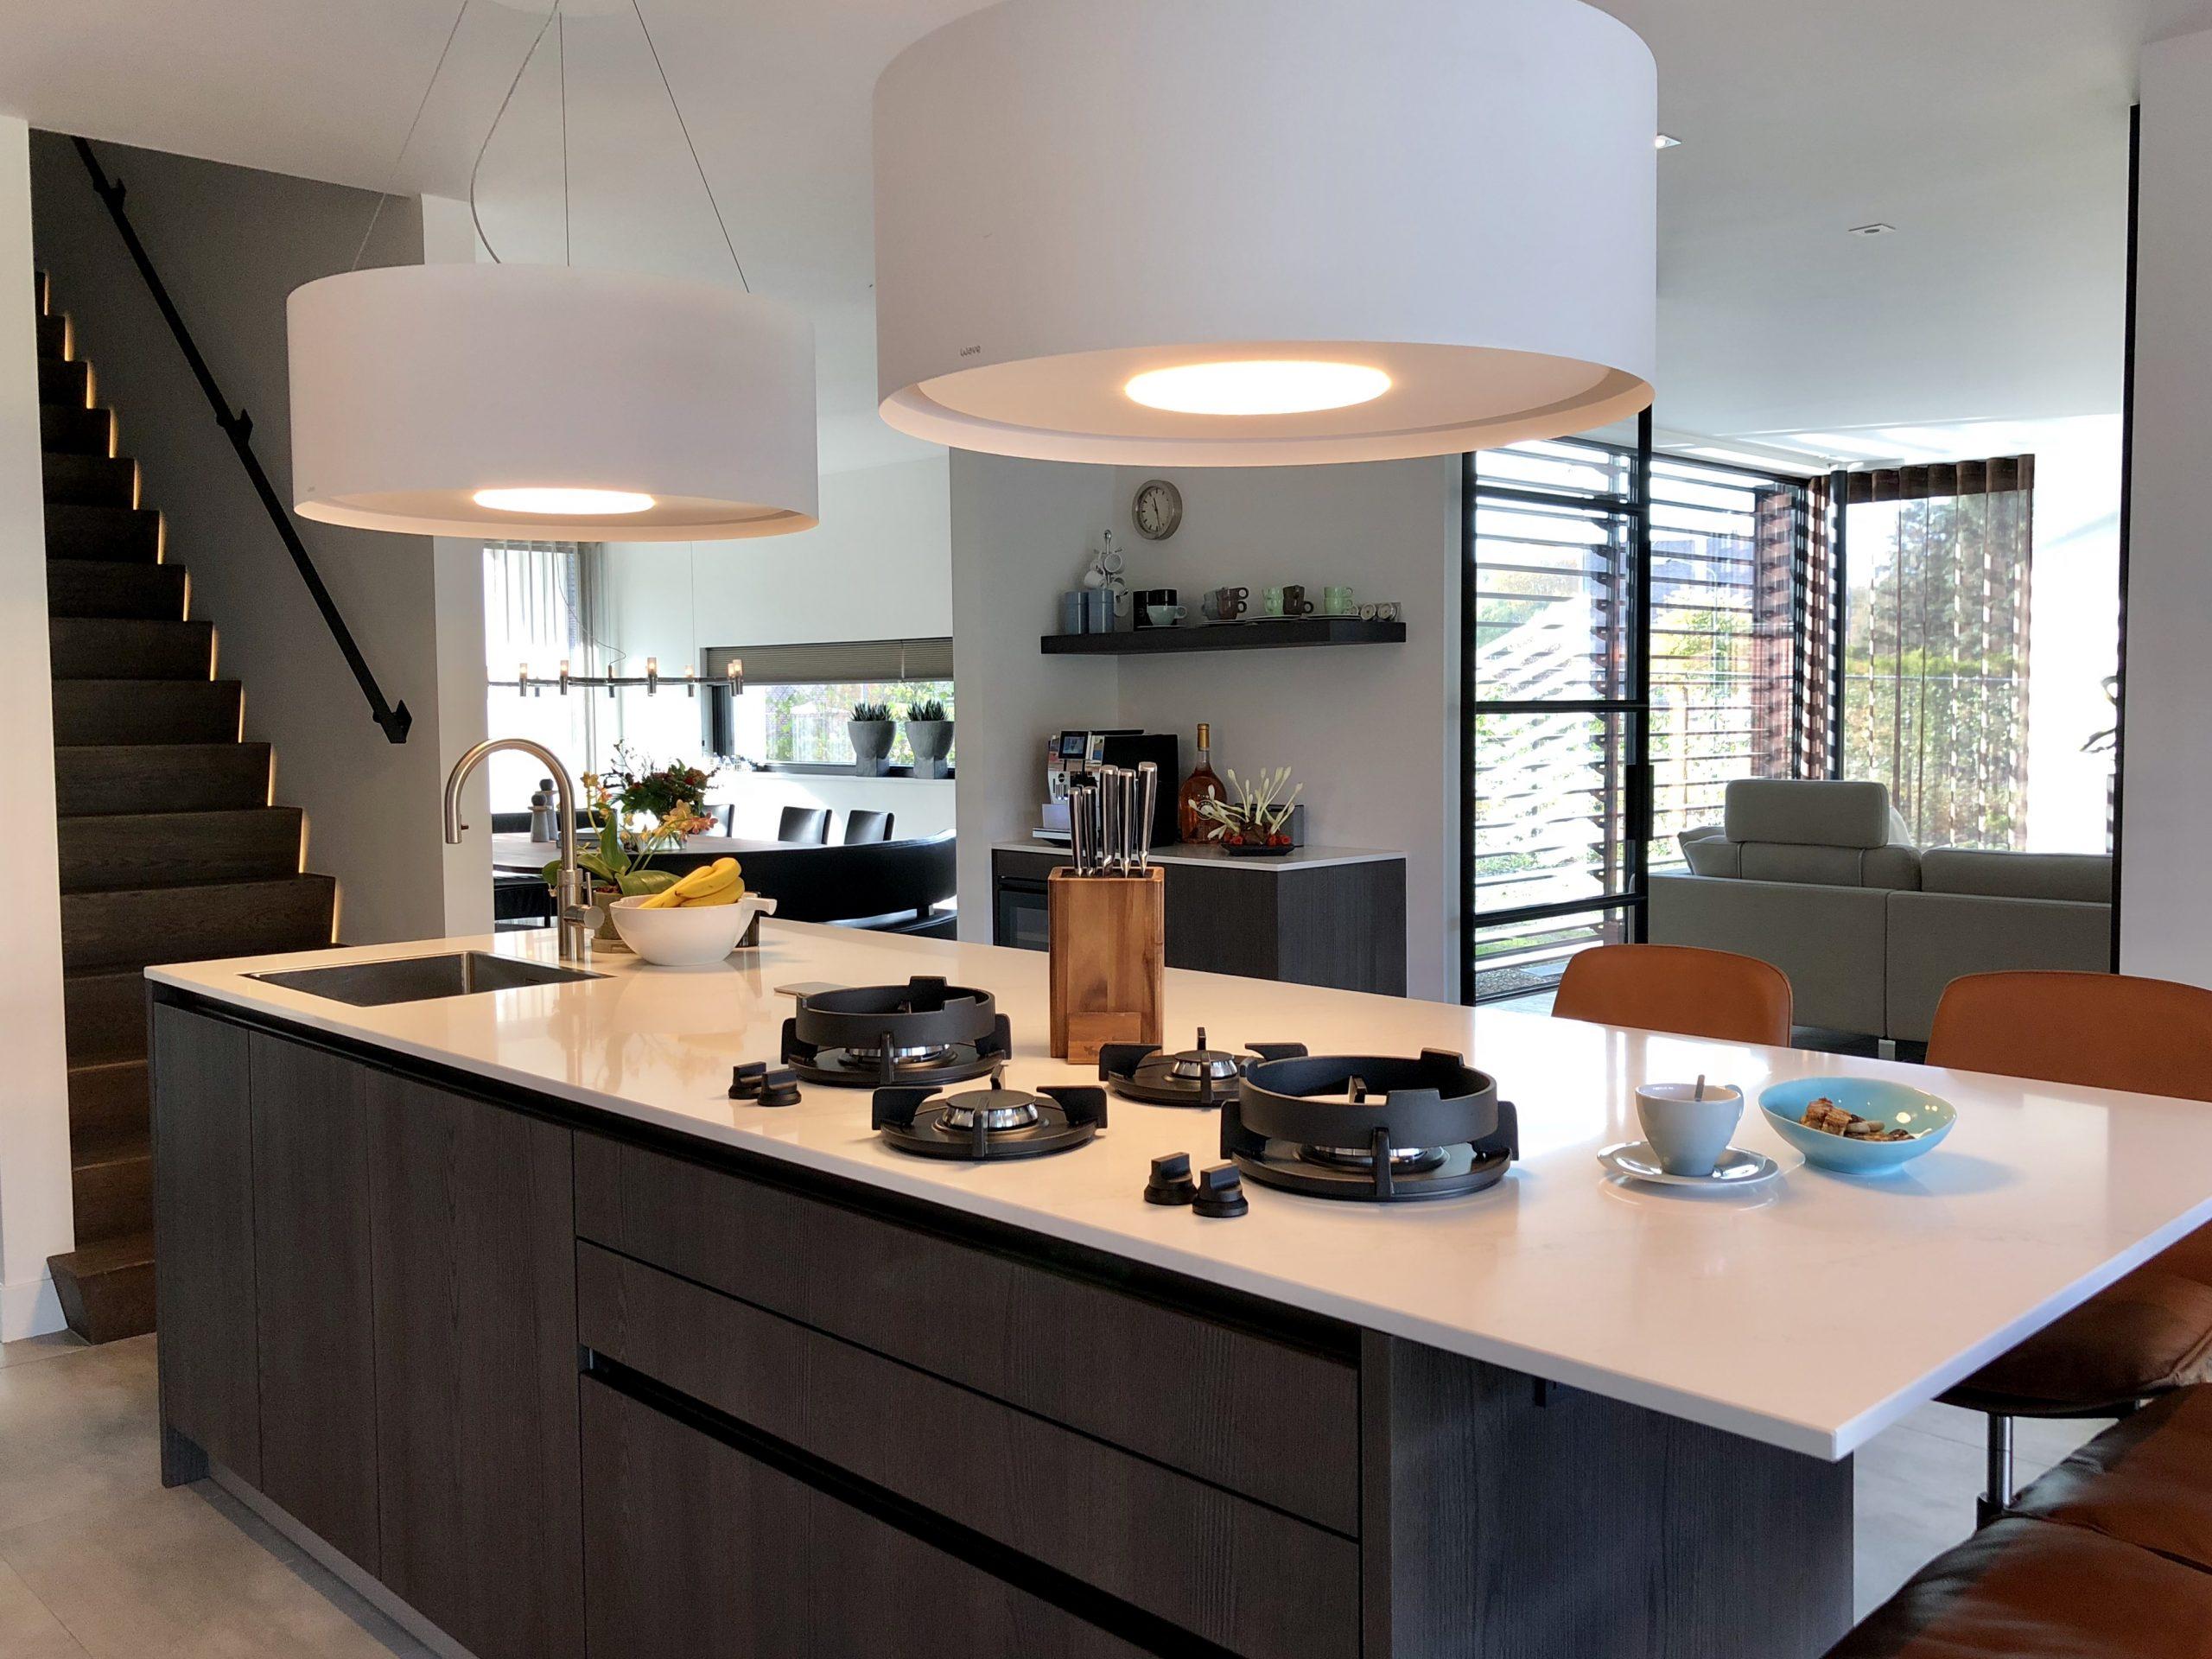 designkeuken met kookeiland en miele keukenapparatuur